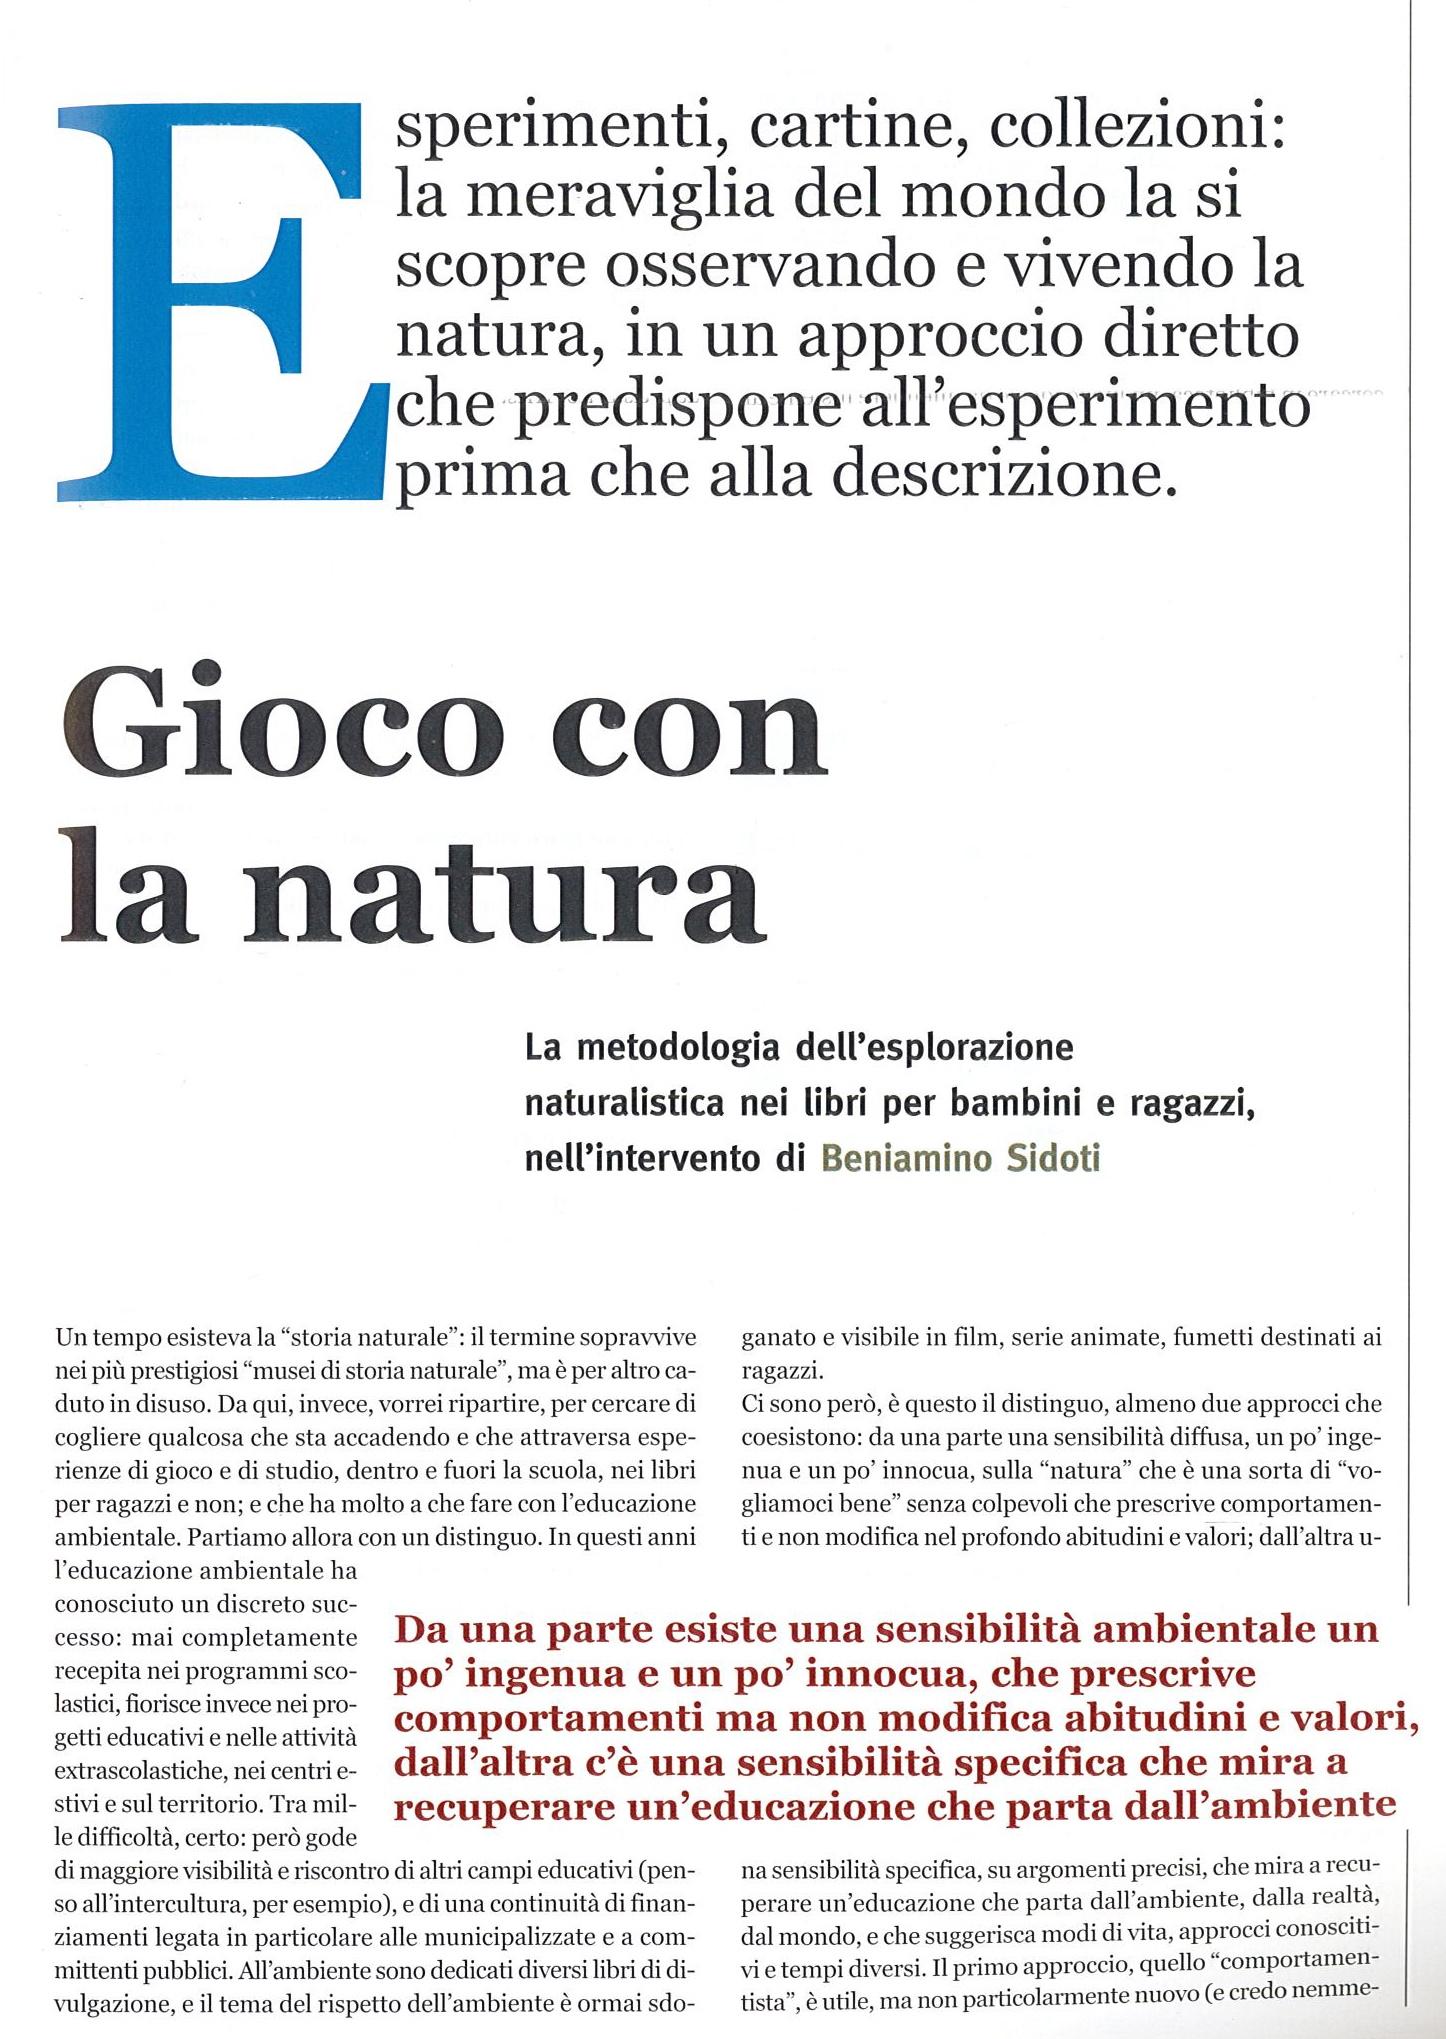 https://www.storiepertutti.it/wp-content/uploads/2021/05/Gioco-natura-1.jpg